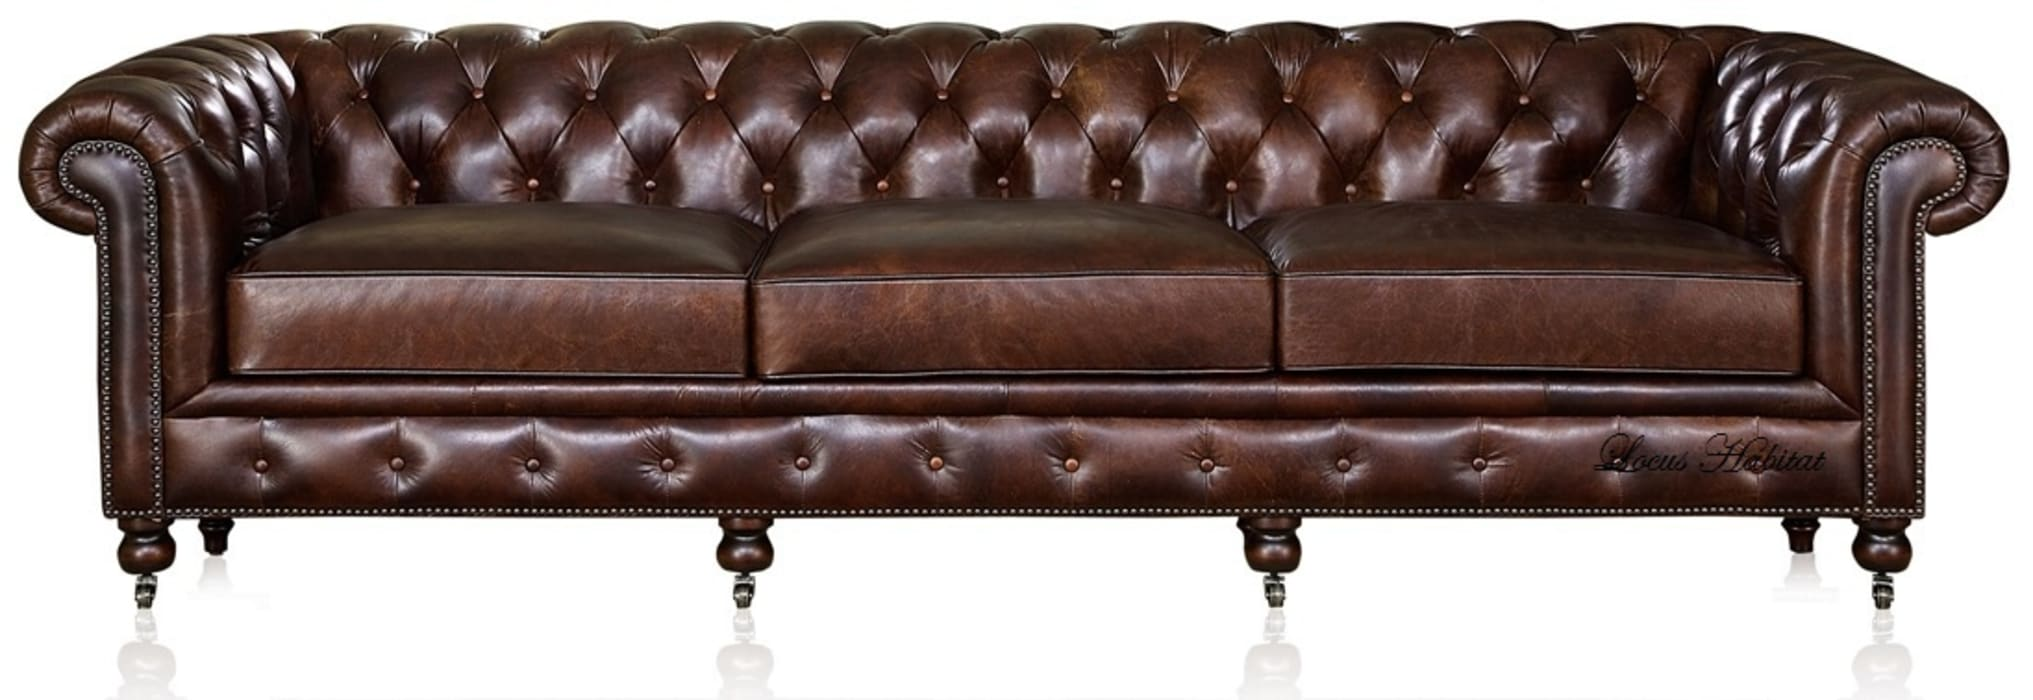 Leather Chesterfield Sofa de Locus Habitat Clásico